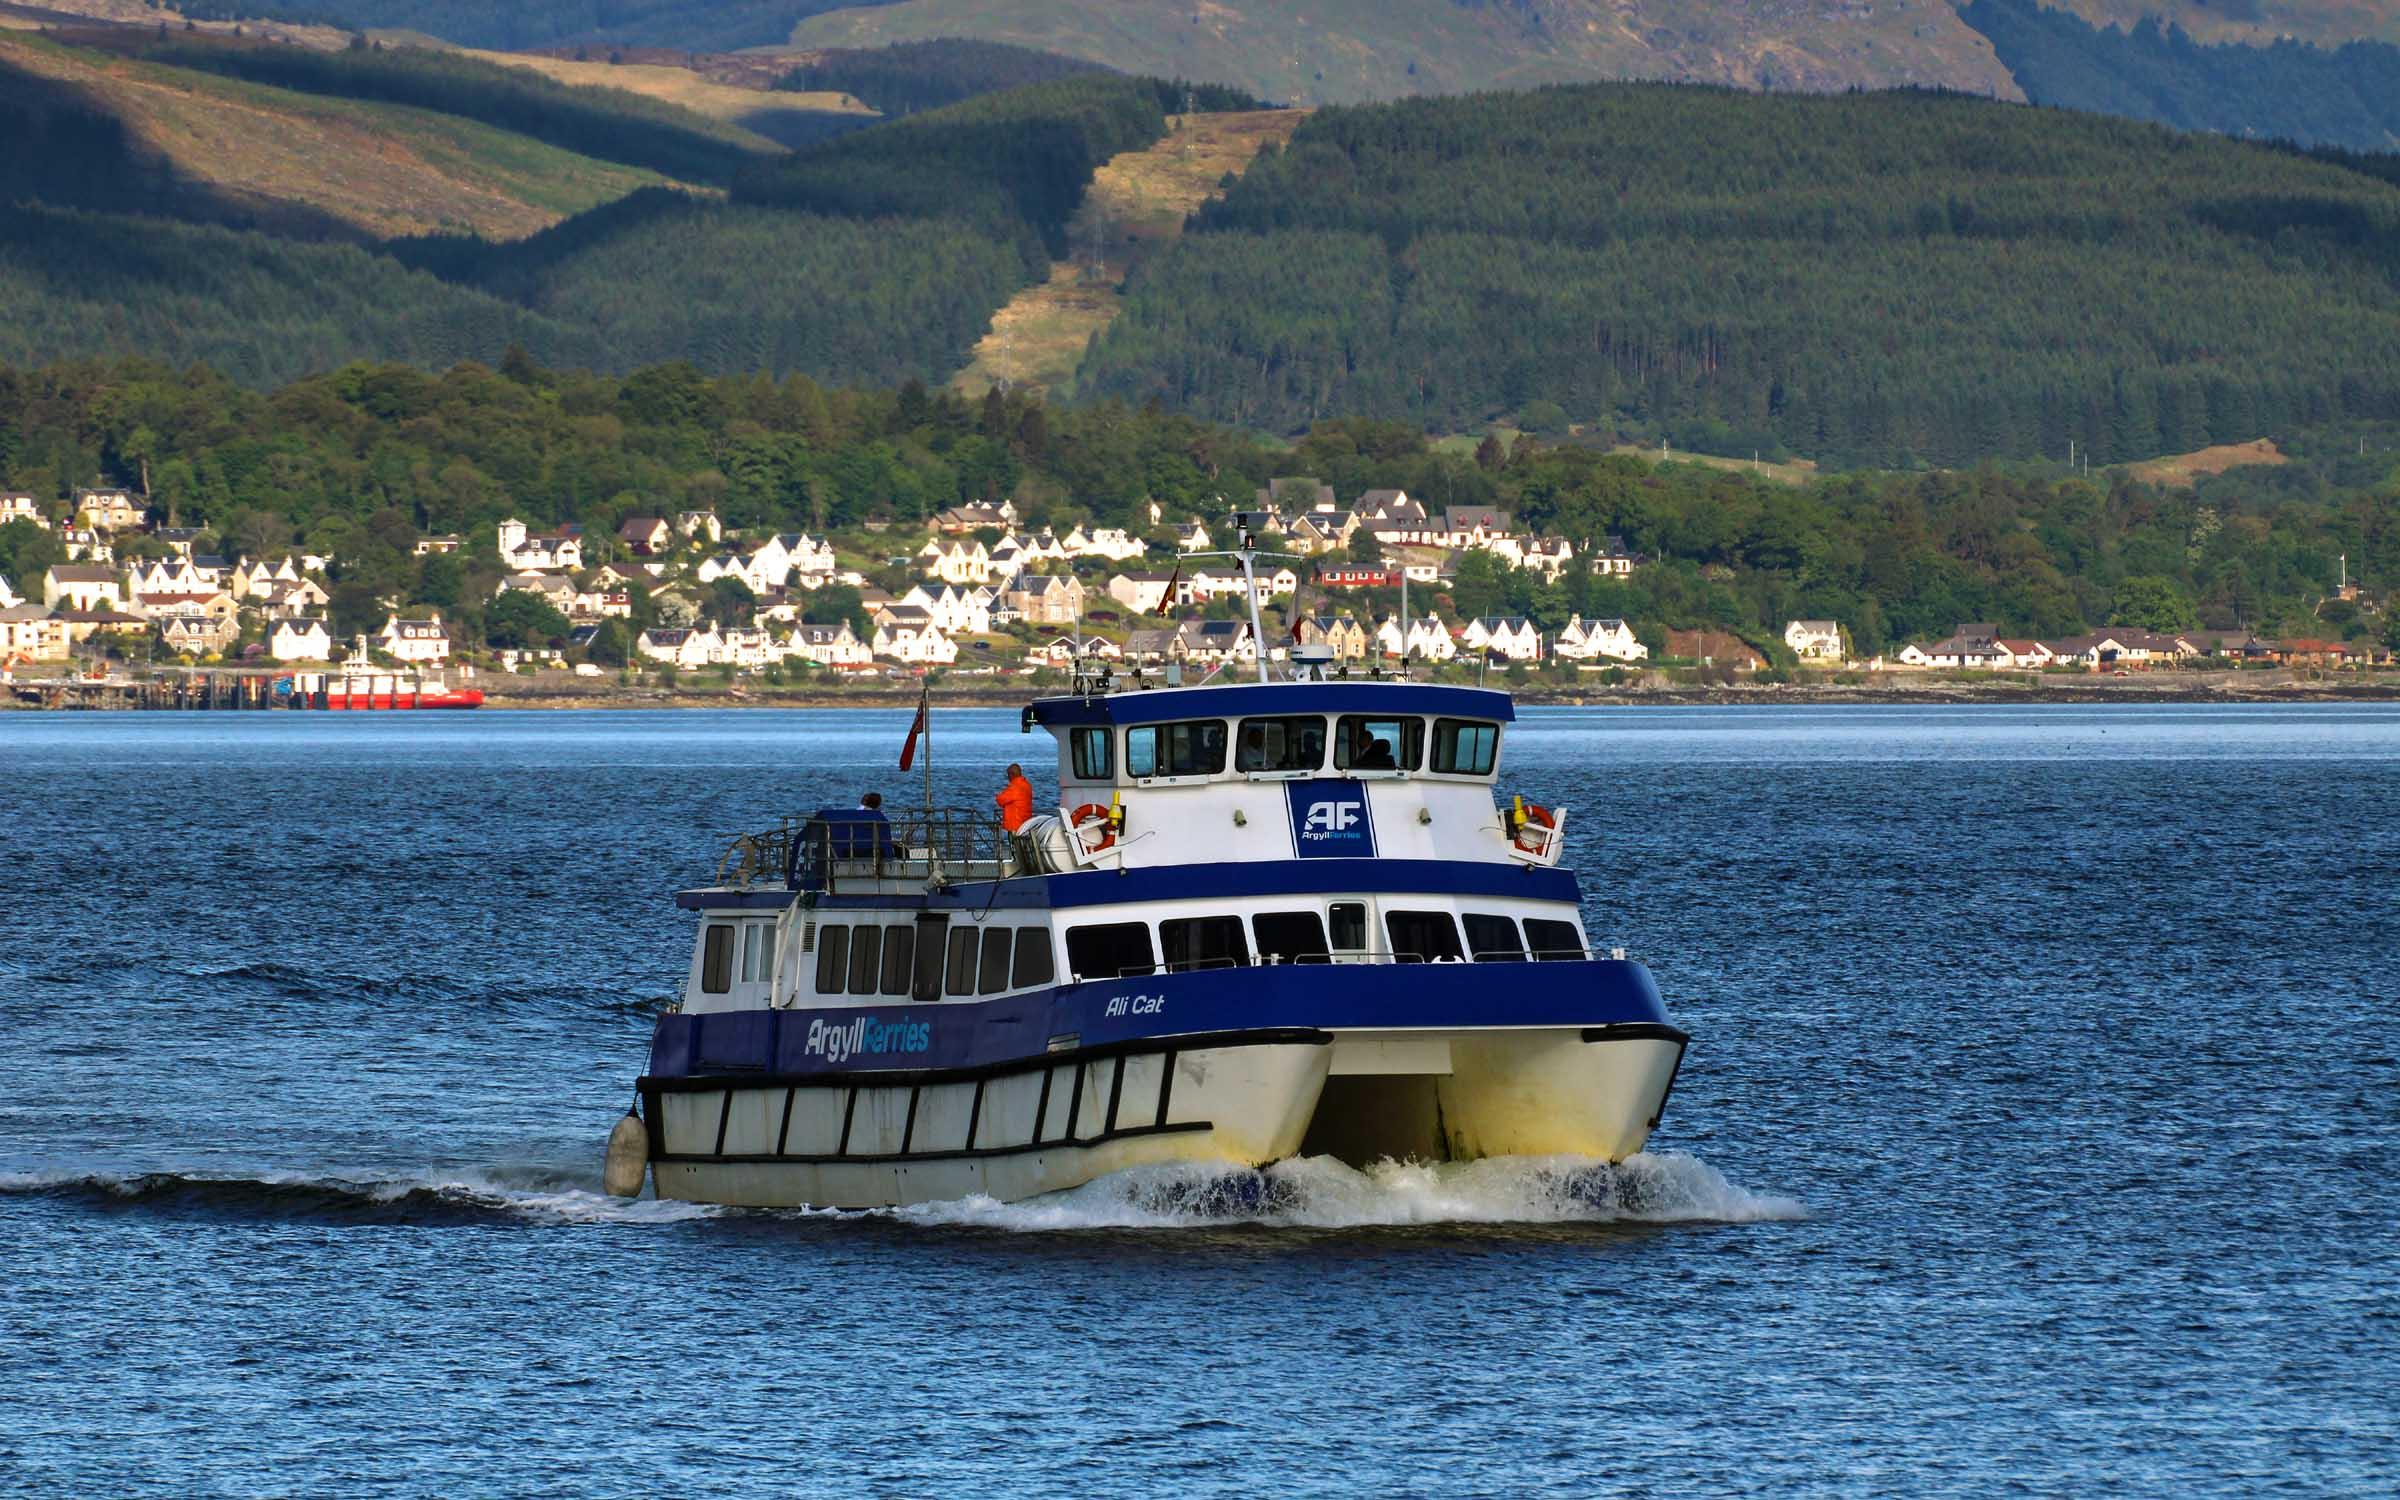 Ali Cat in Argyll Ferries colours